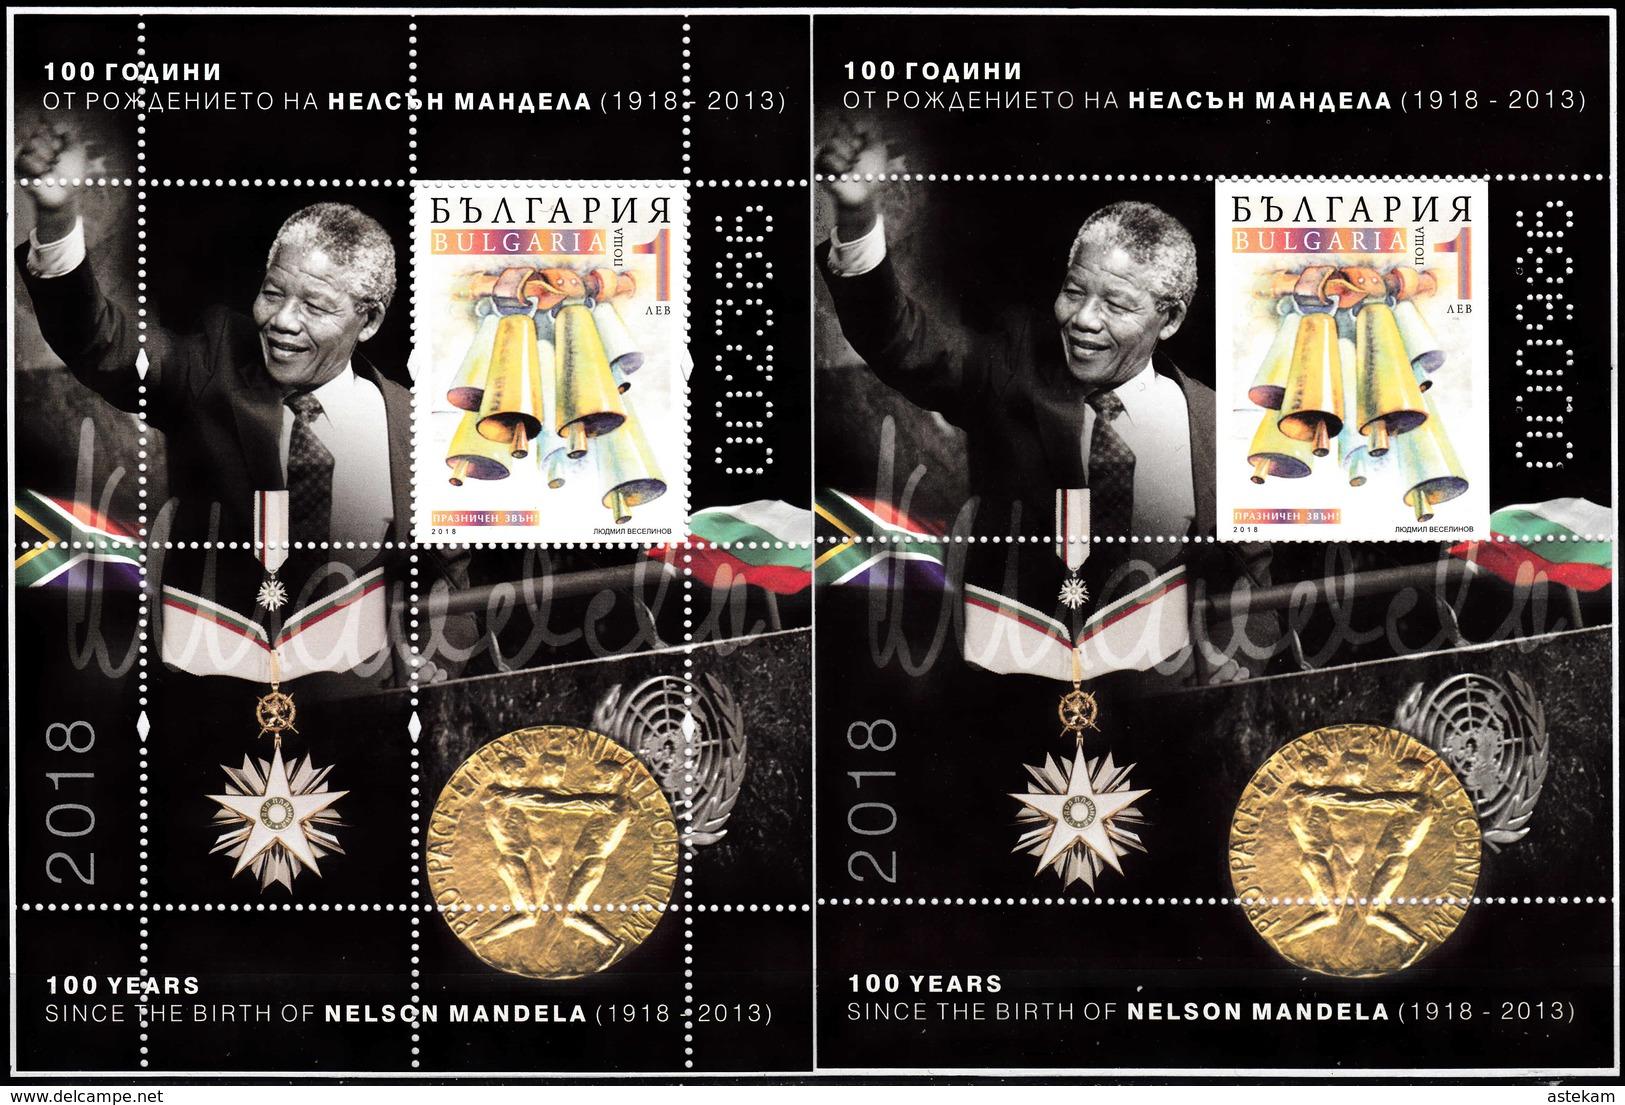 BULGARIA 2018 NELSON MANDELA 100 Years Of HIS BIRTH TWO MNH SOUVENIR SHEETS - Bulgaria